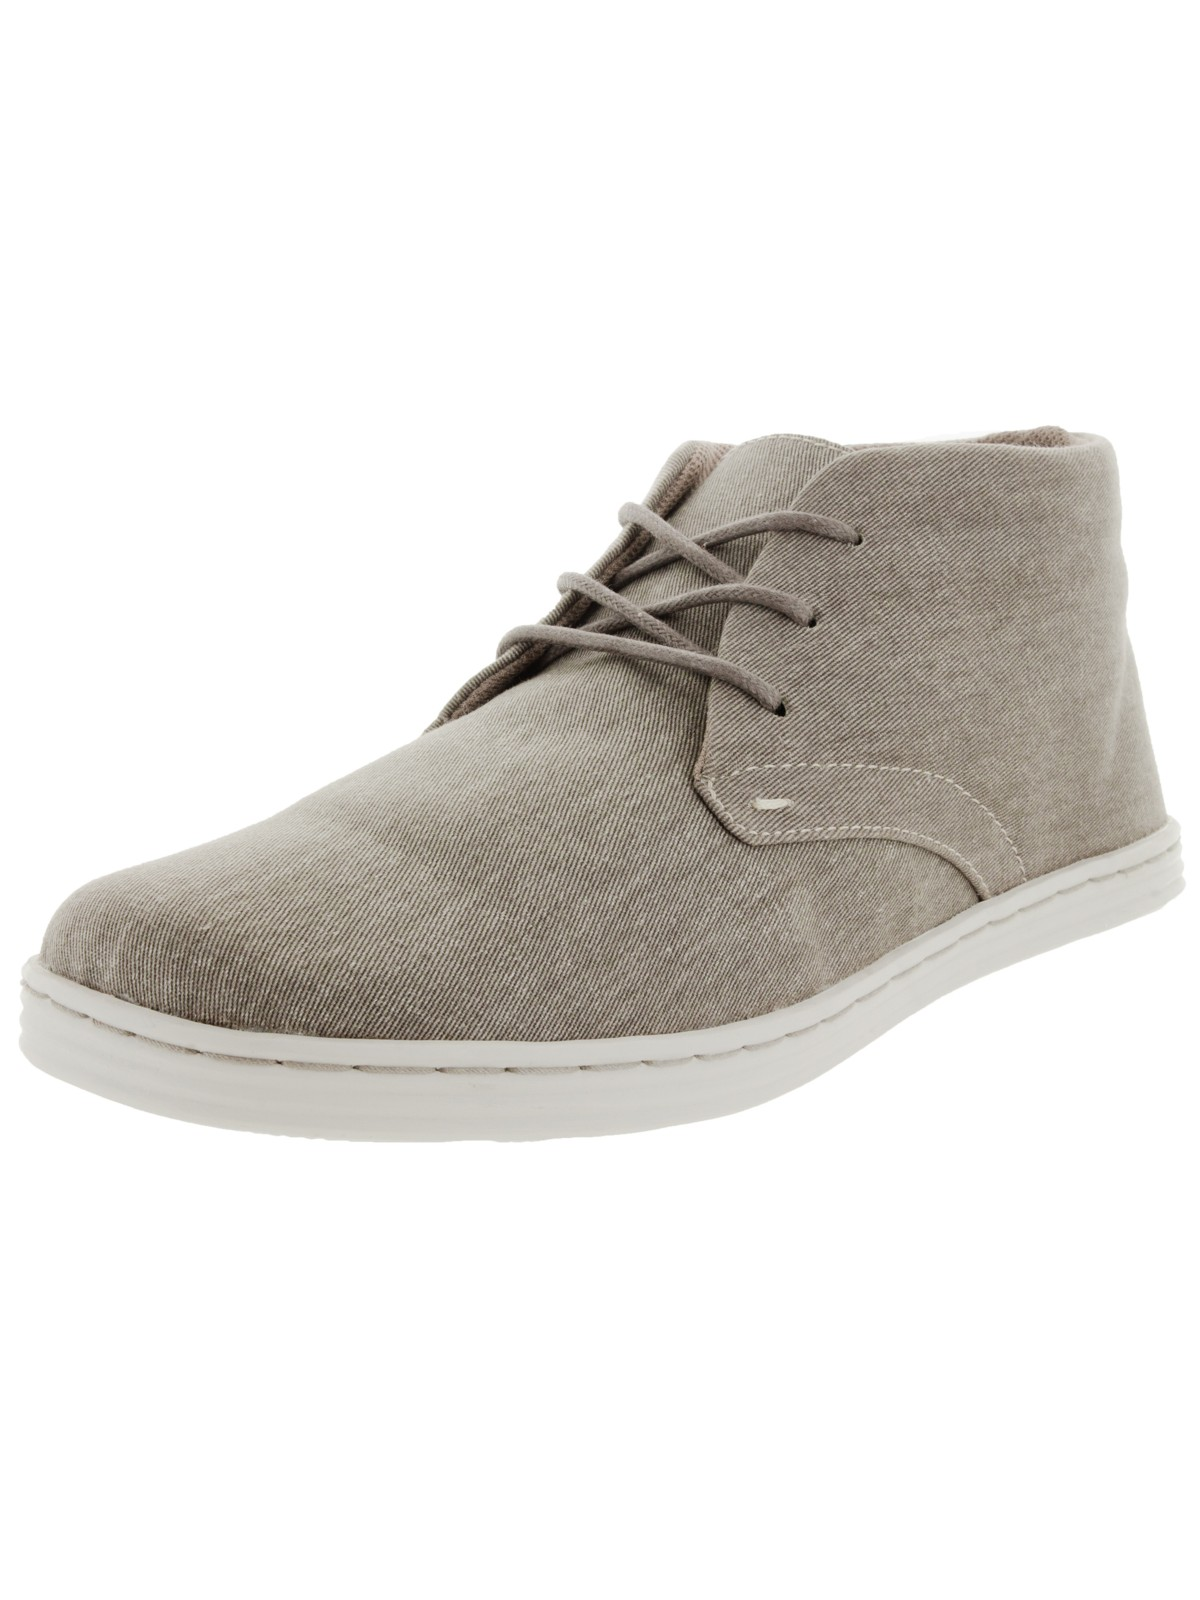 Sebago Men's Barnet Chukka Casual Shoe by Sebago